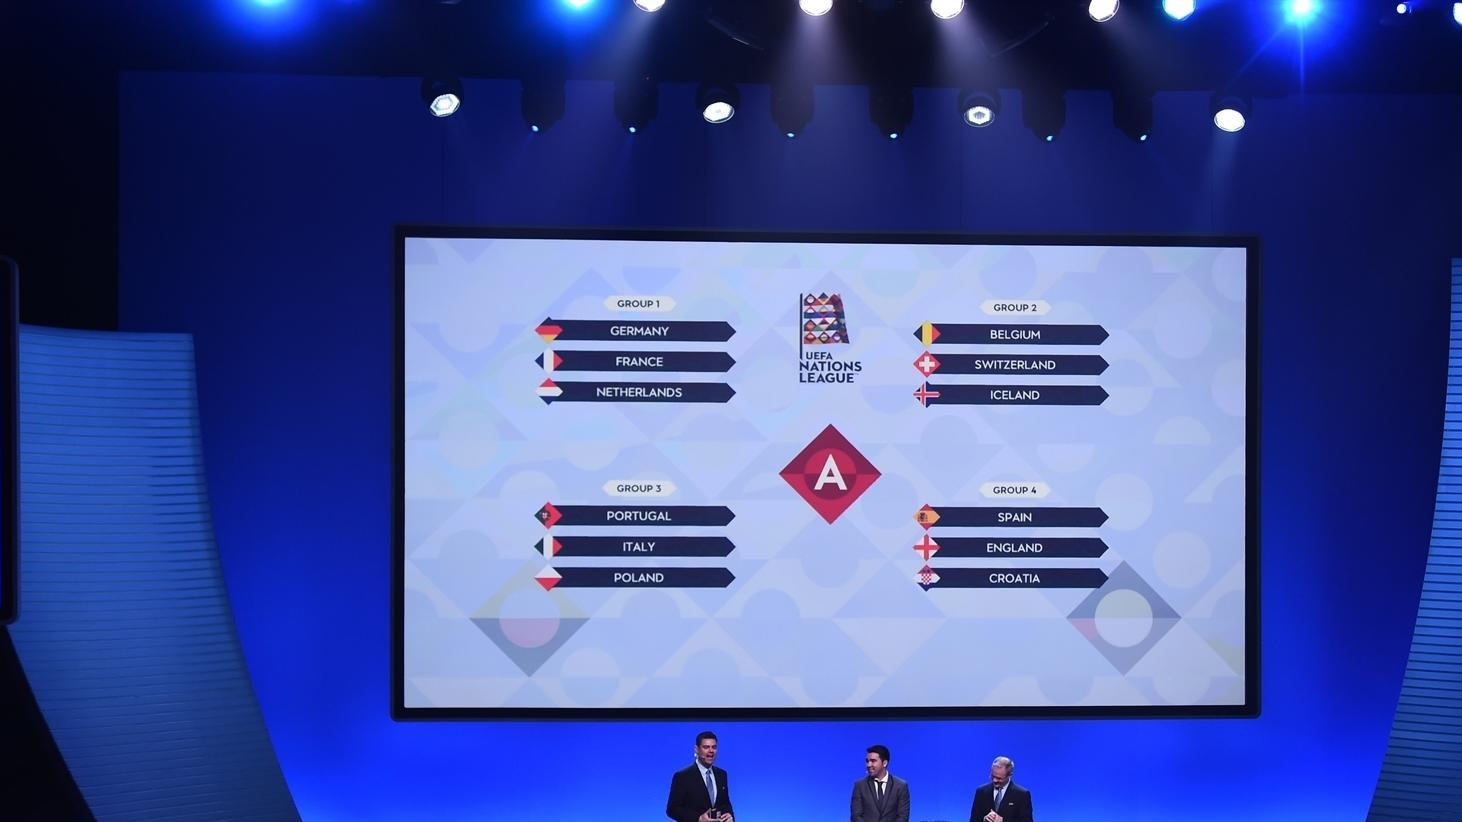 Uefa Nations League 2018 19 League Phase Draw Uefa Nations League Uefa Com